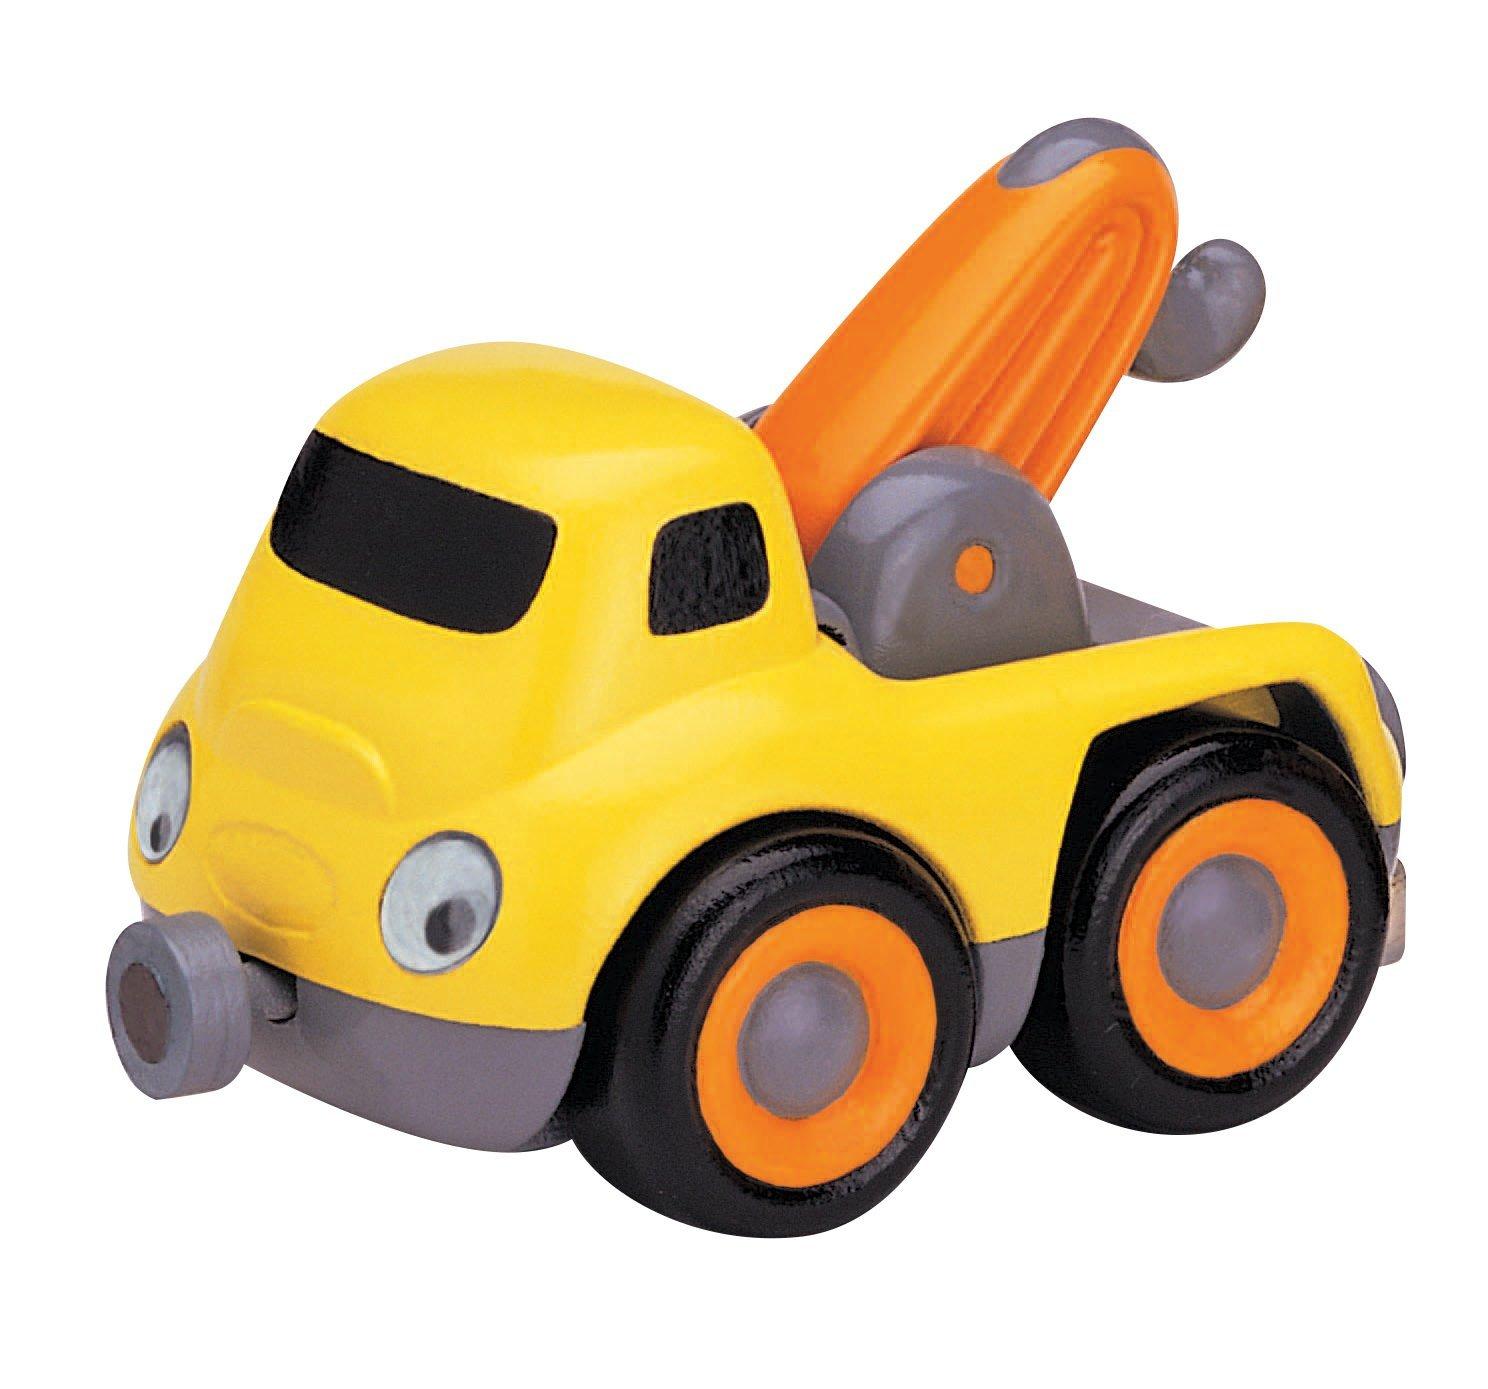 Small World Preschool Tailgate Trios Construction Small World Toys 7401804